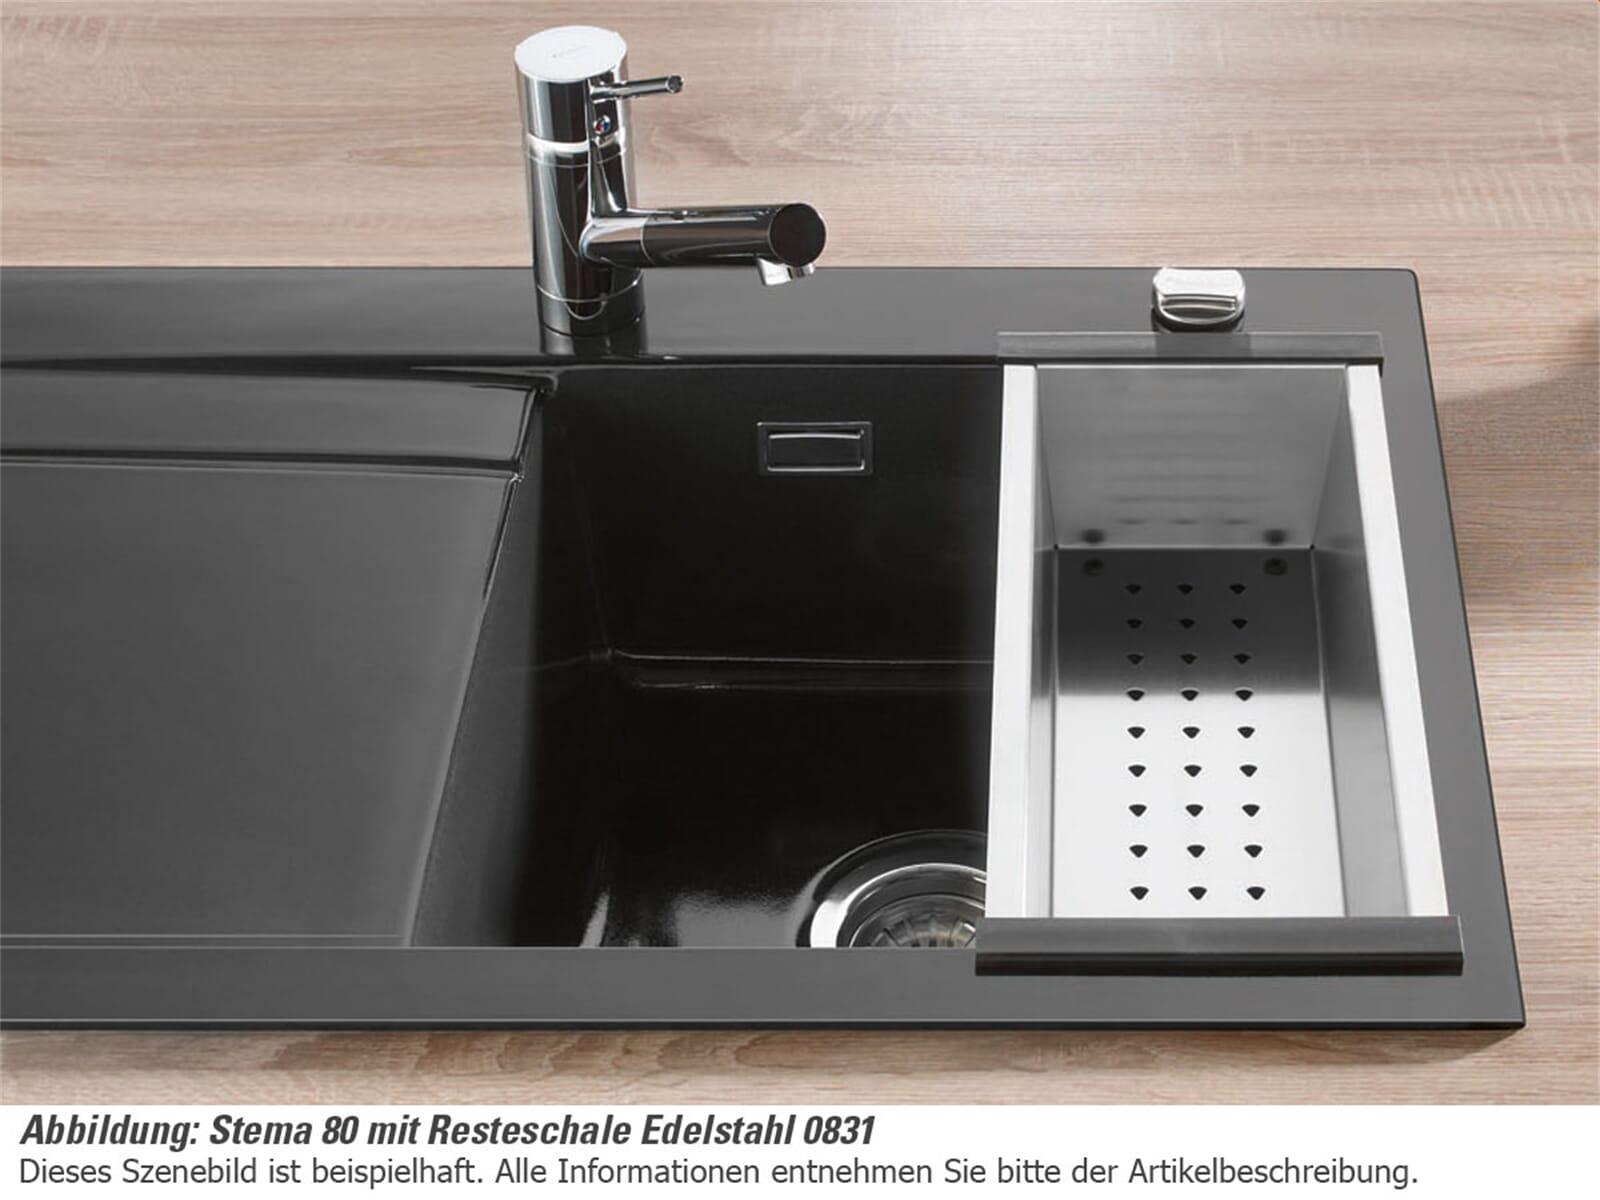 Systemceram Resteschale Edelstahl 0831